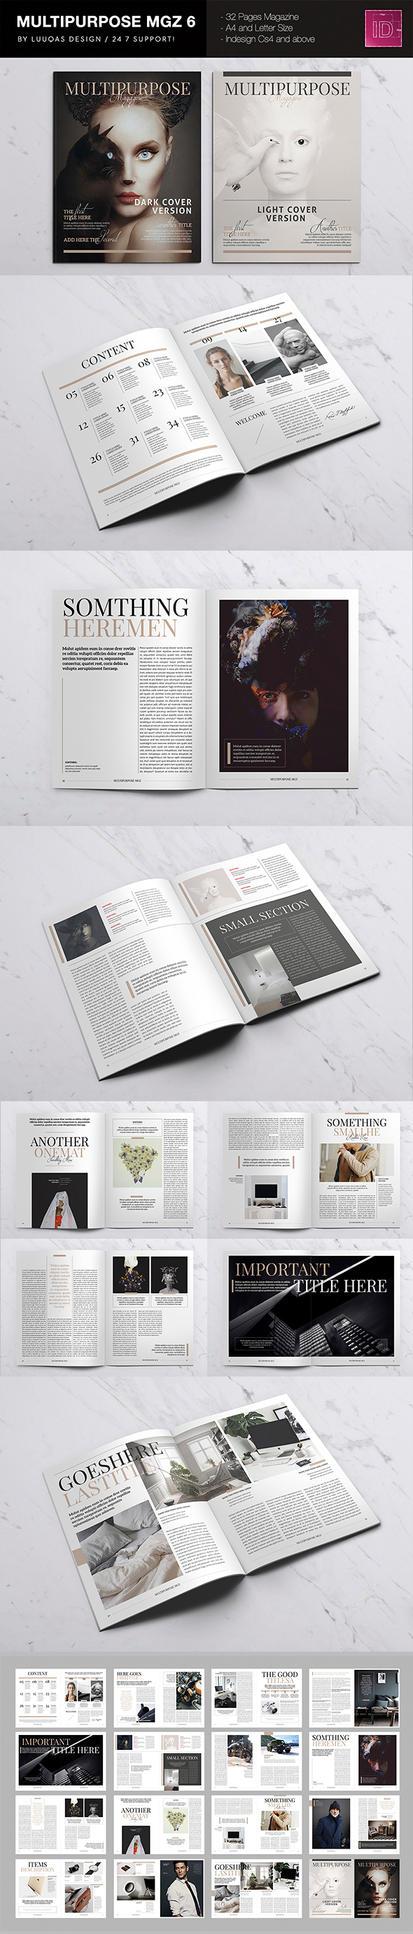 Multipurpose Magazine 6 by luuqas